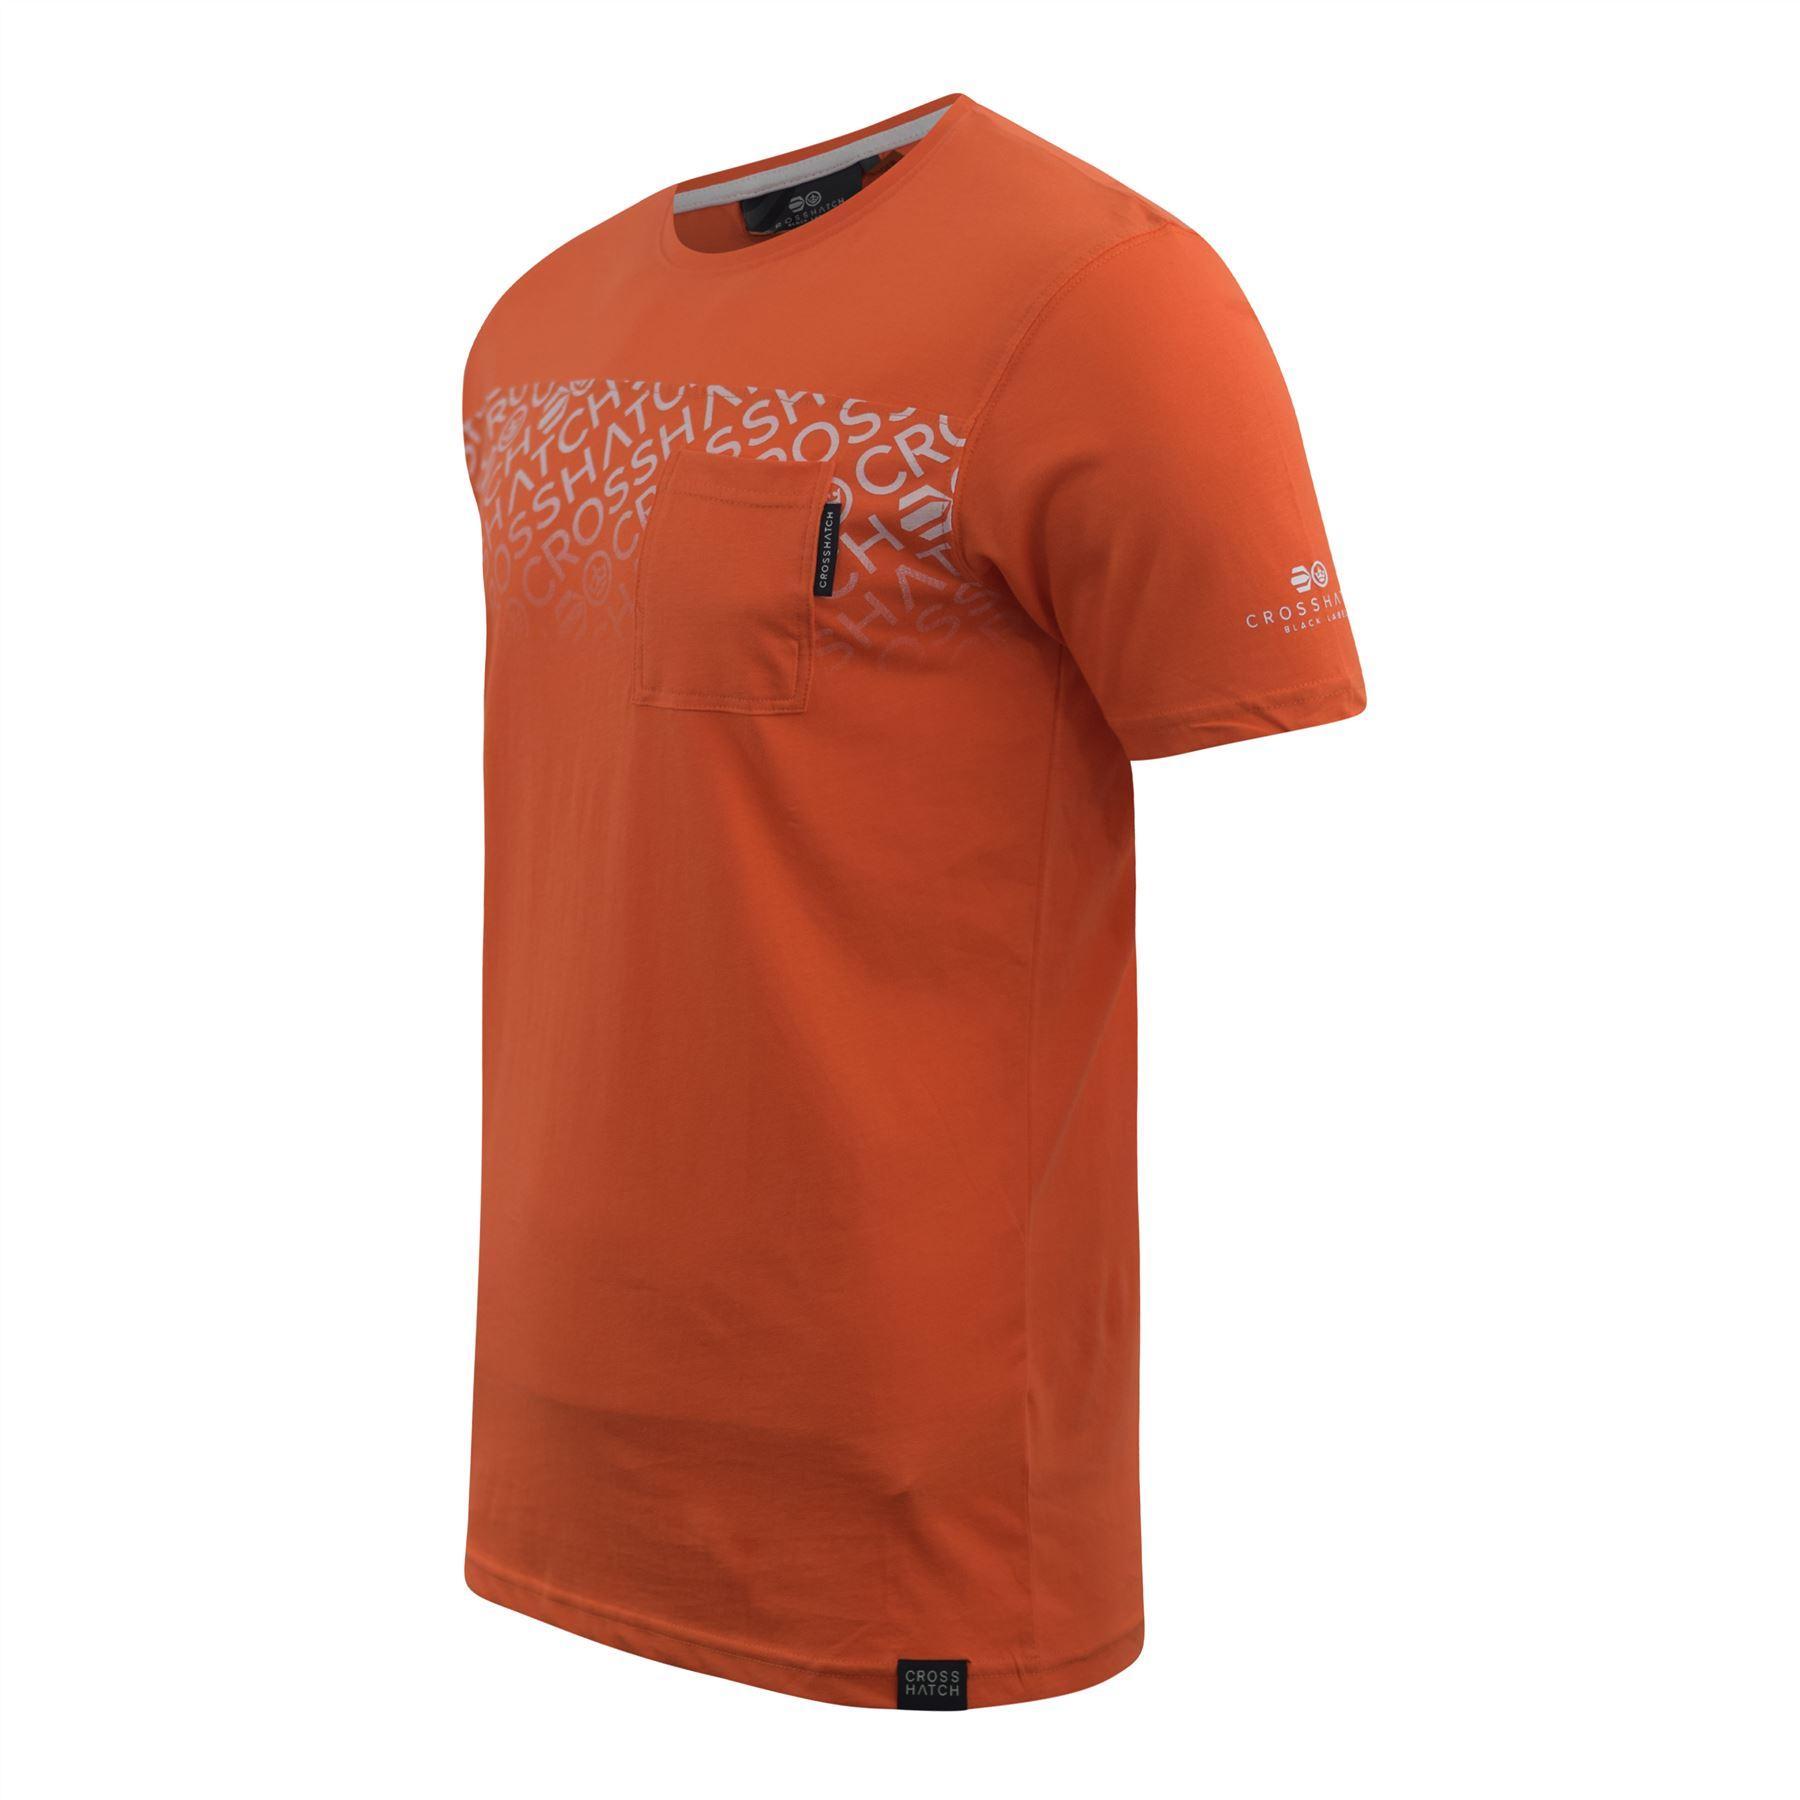 Mens-Crosshatch-T-shirt-Contrast-Graphic-Print-Top-Tee-Westfan thumbnail 6